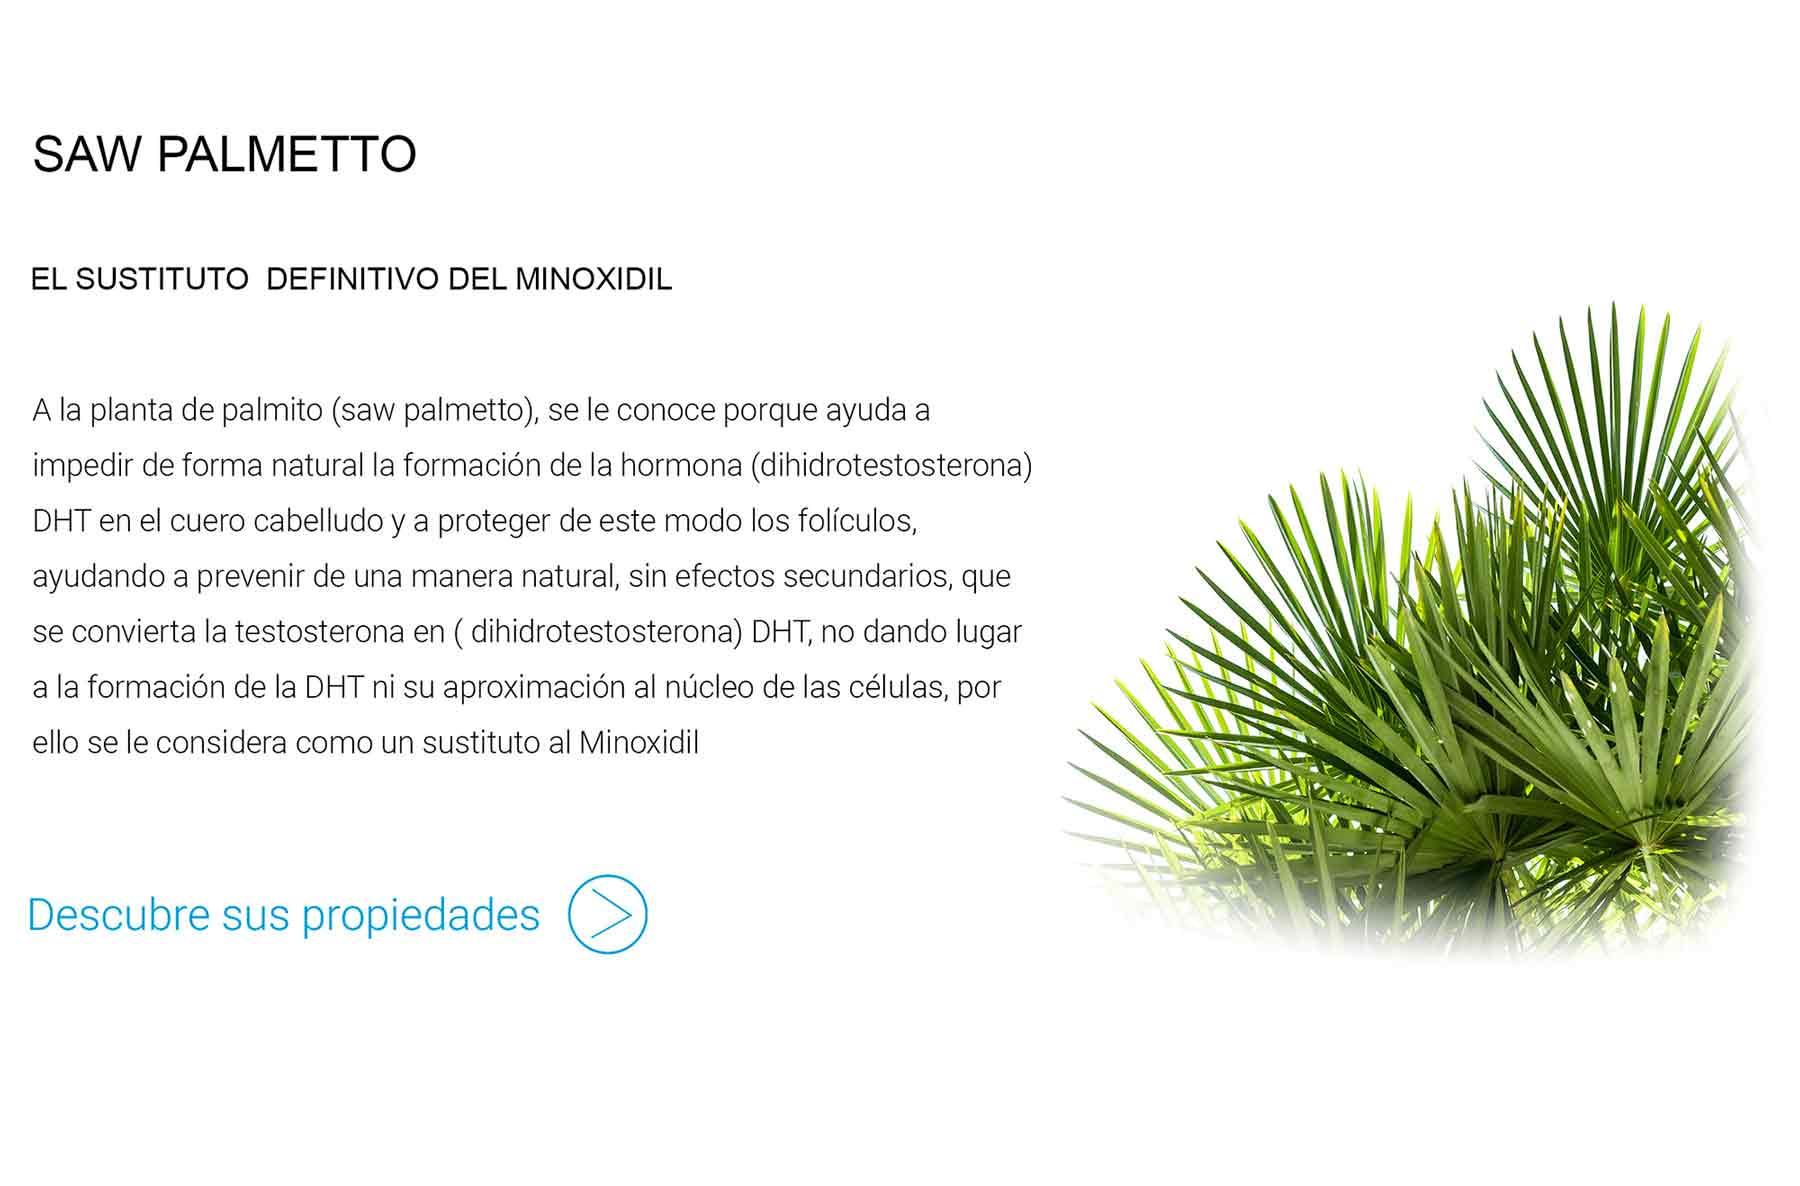 saw-palmetto-sustitutivo-minoxidil.jpg